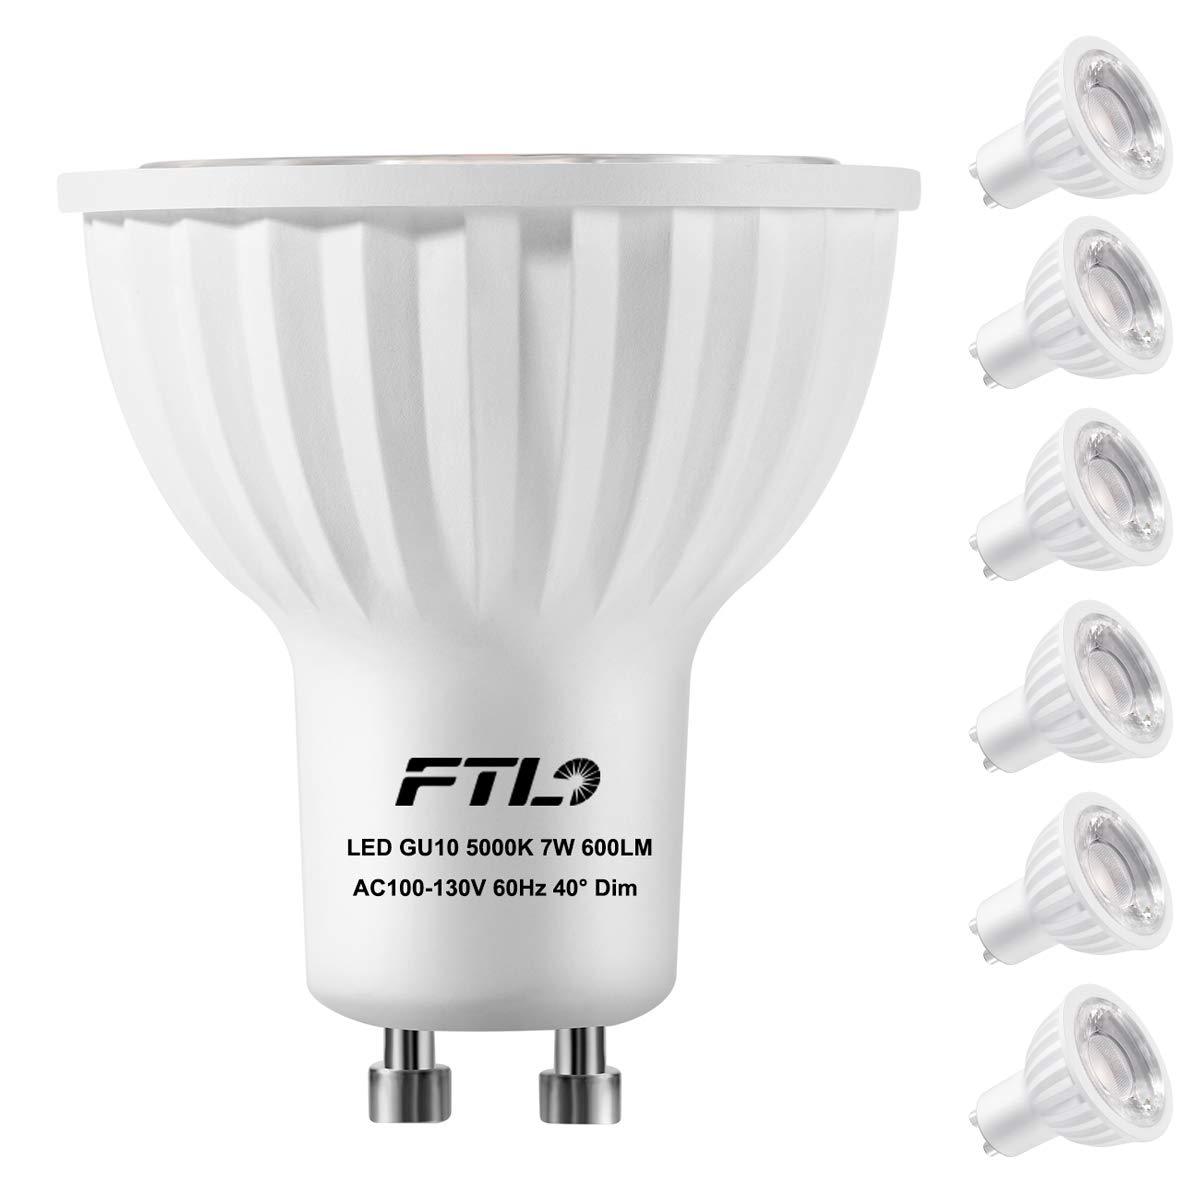 GU10 LED Light Bulbs, Dimmable 7 Watt Spotlight, Daylight White 5000K,50W 75W Halogen Bulbs Equivalent,CRI>80+,Track Lighting and Recessed Lighting Bulbs,6-Pack